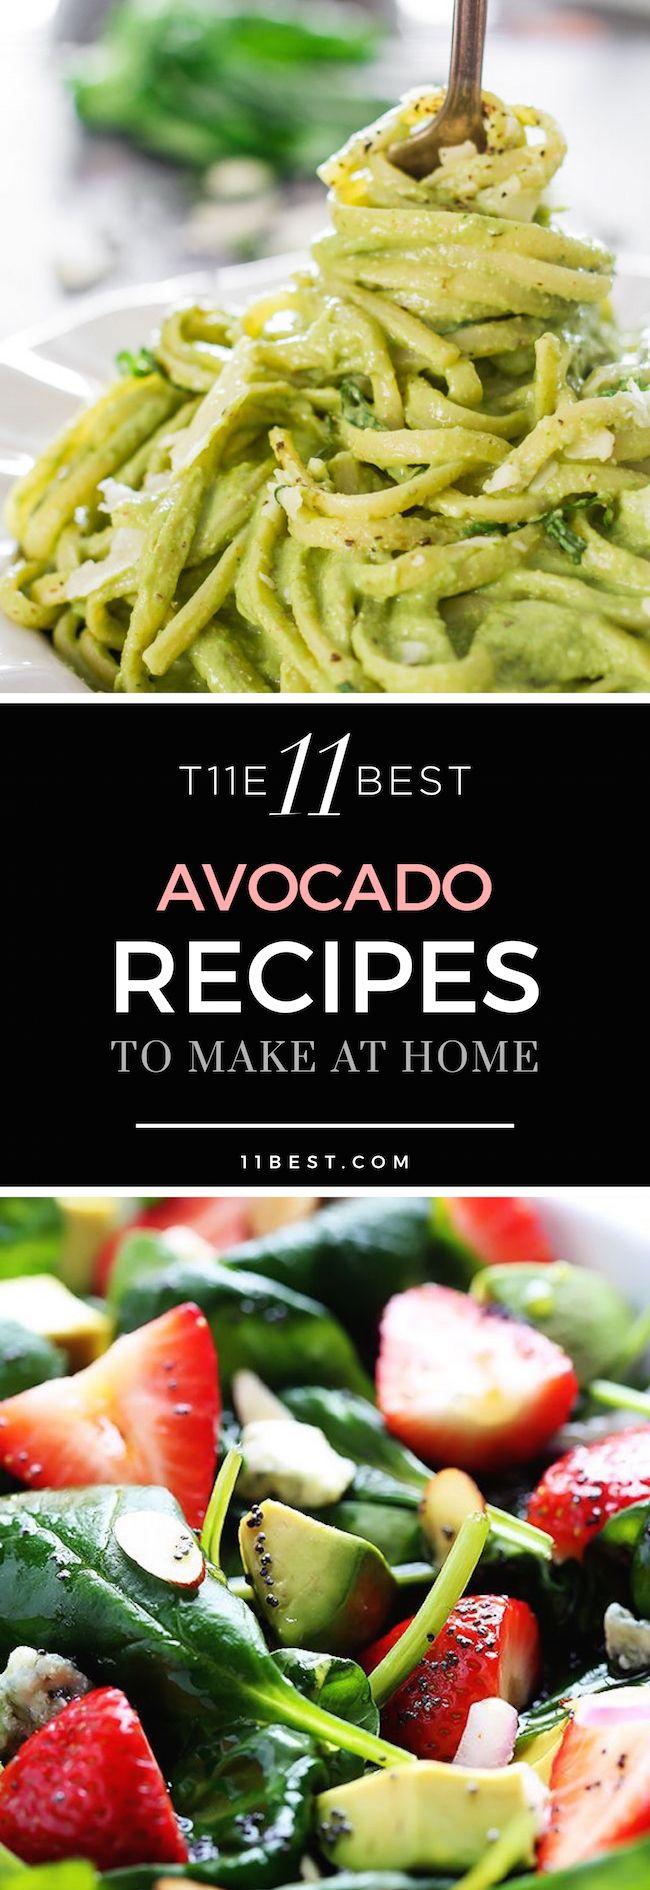 The 11 Best Avocado Recipes